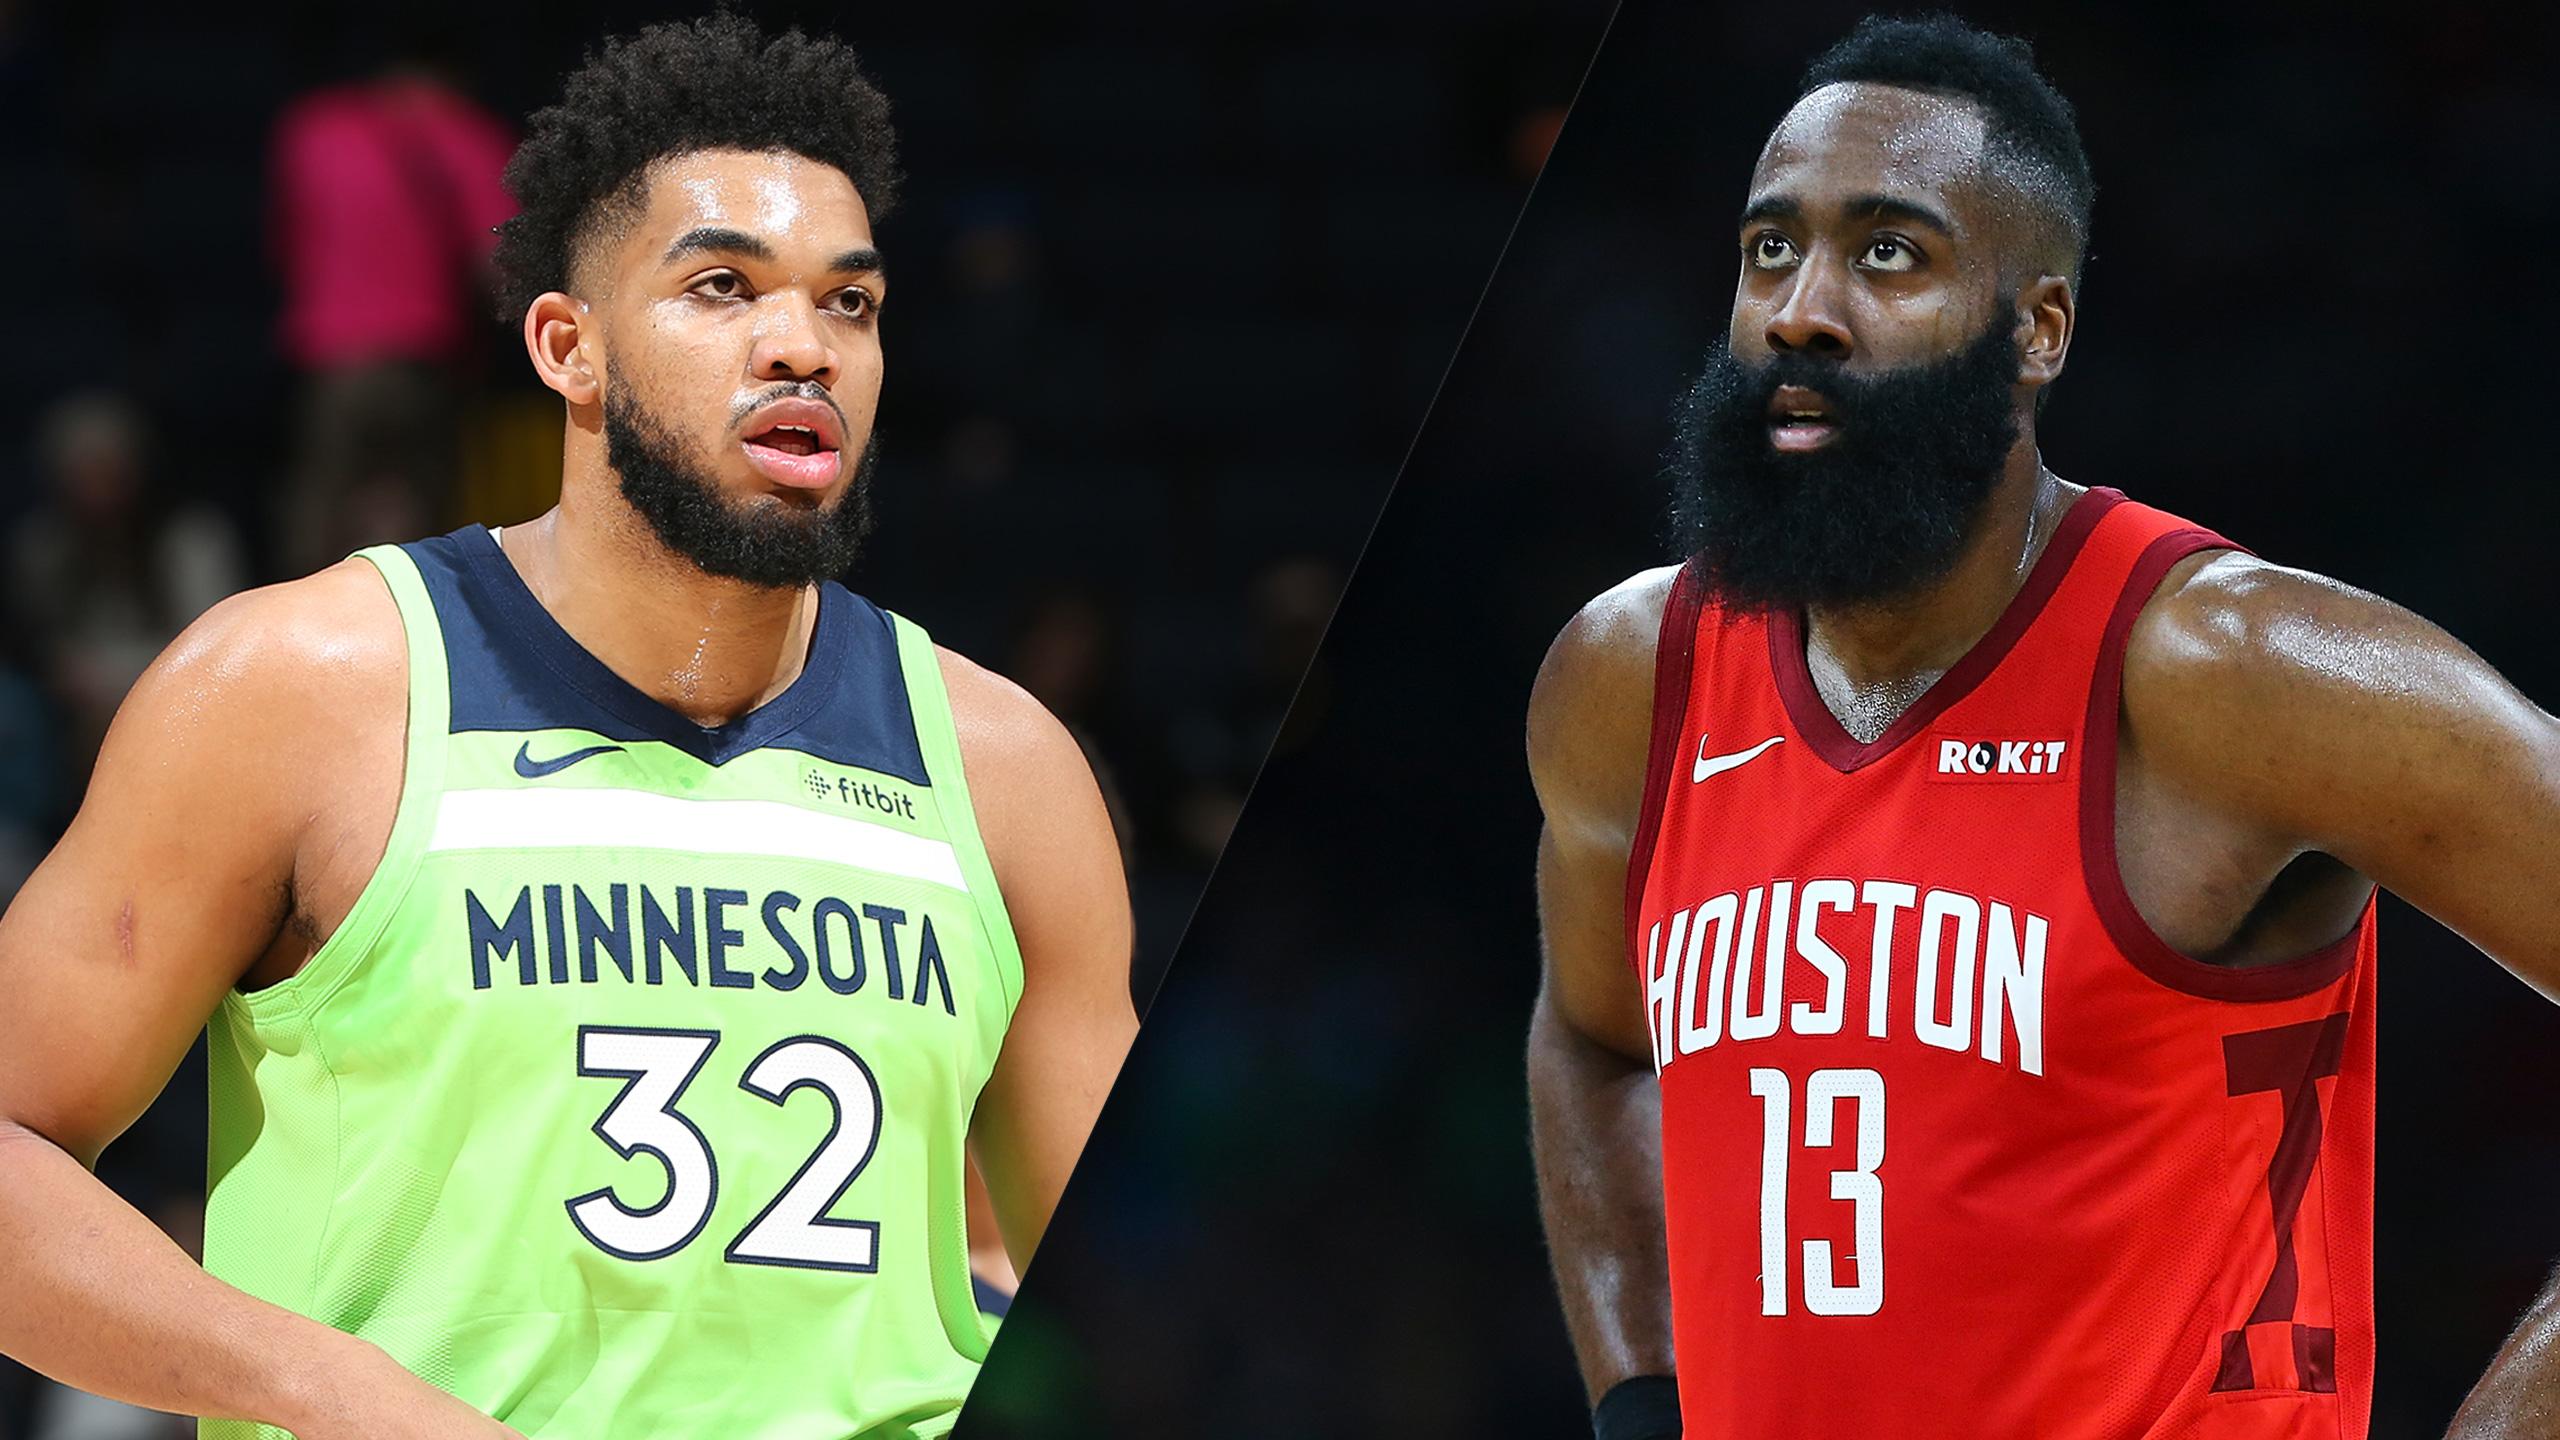 Minnesota Timberwolves vs. Houston Rockets